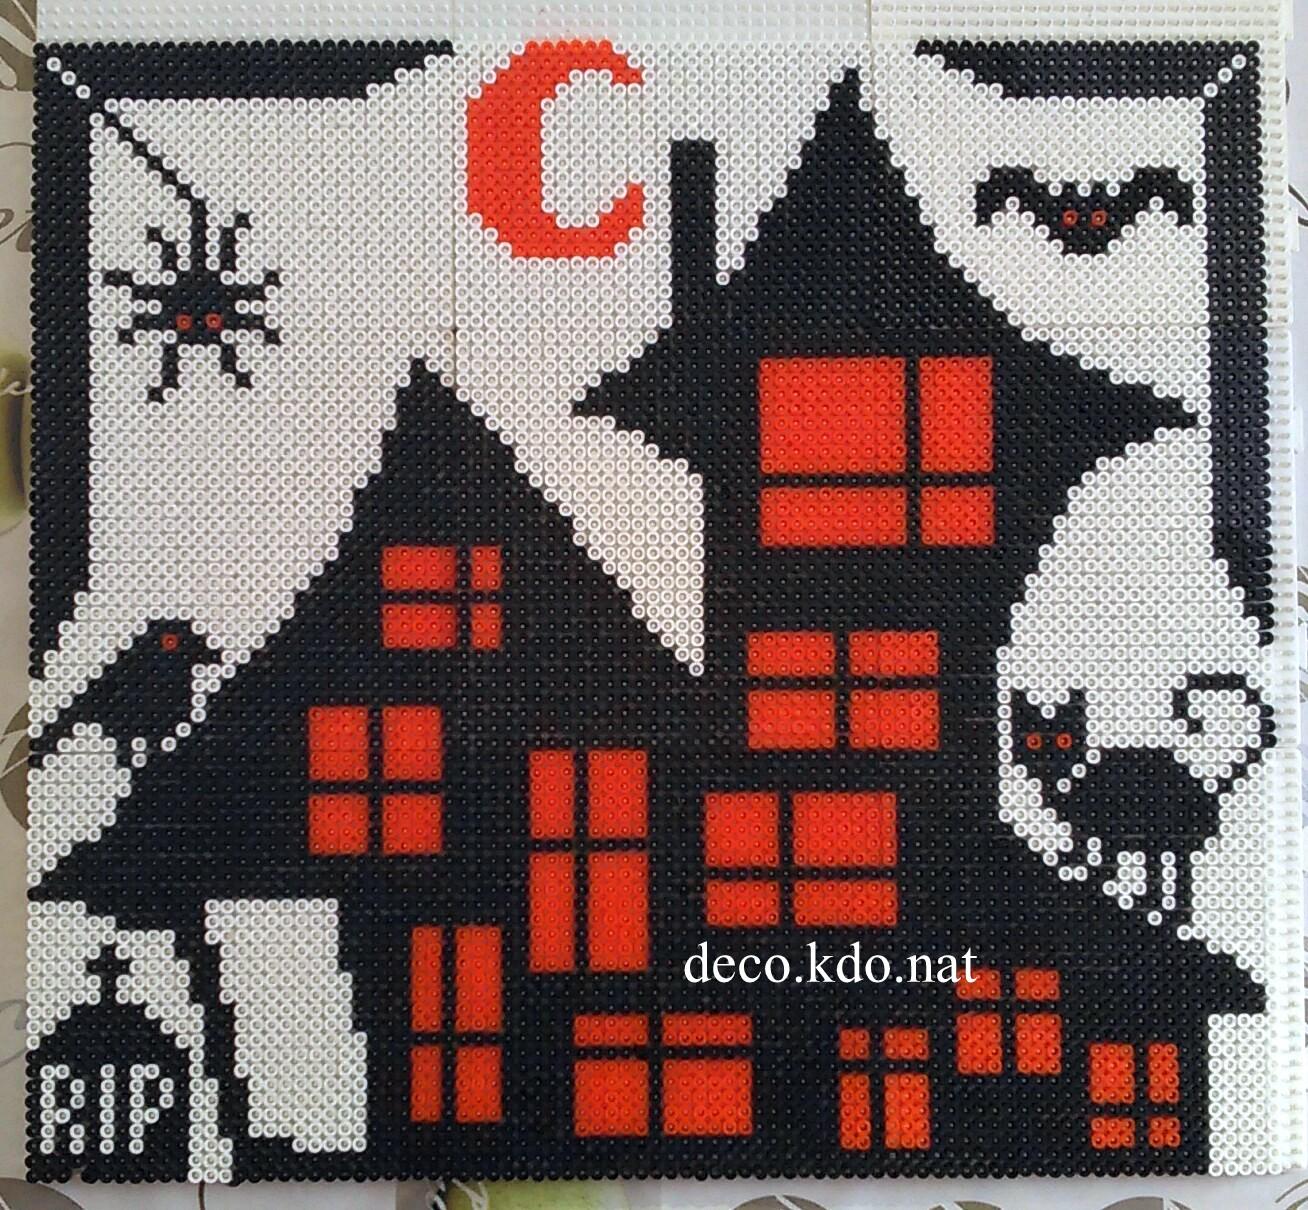 Decokdonat Perles Hama Tableau Halloween Maison Hantée